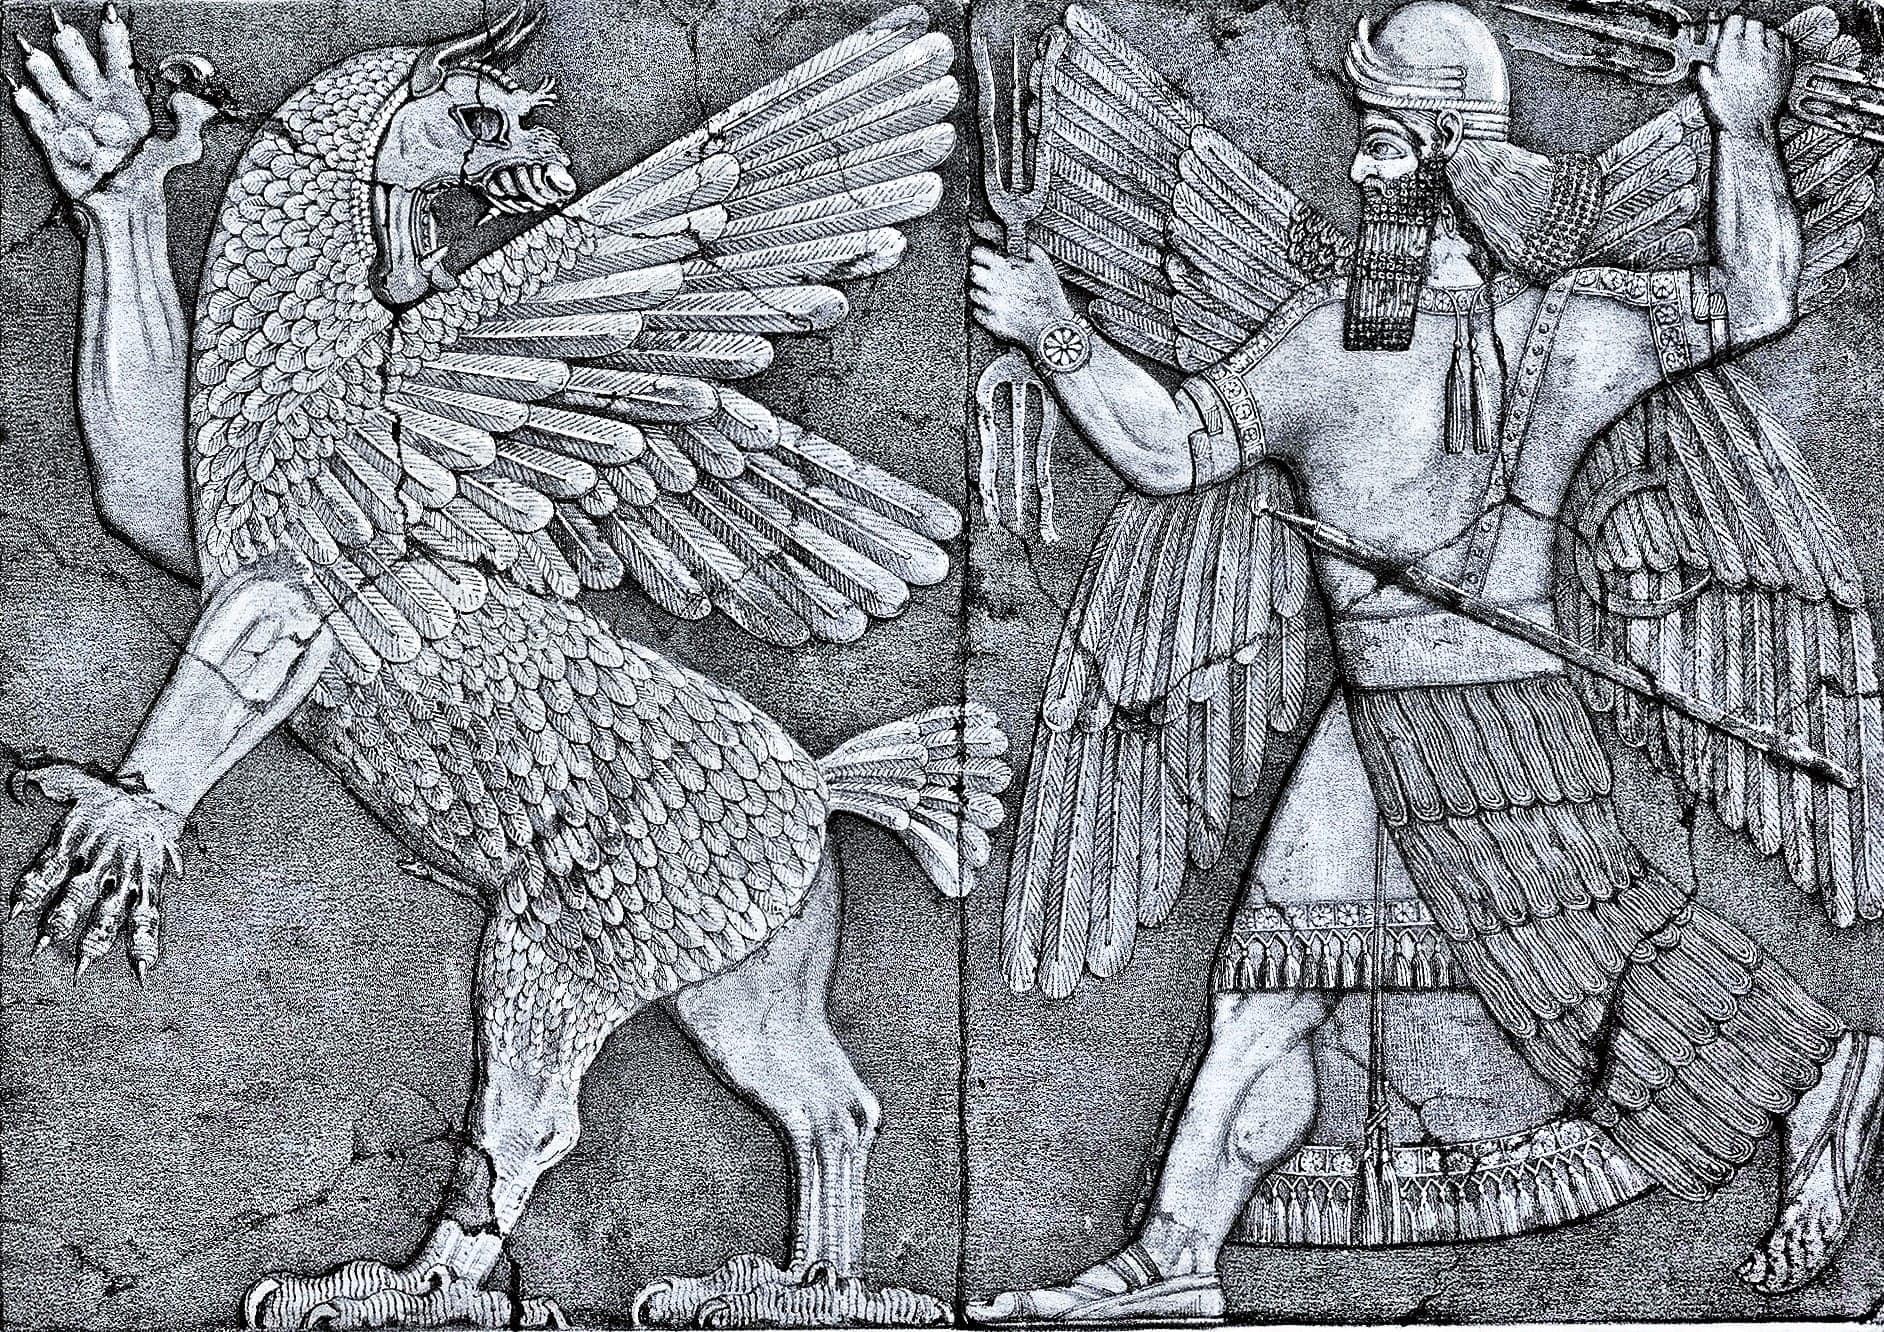 Part One  Mene Tekel Peresin: The gods are judged! - 1260d com